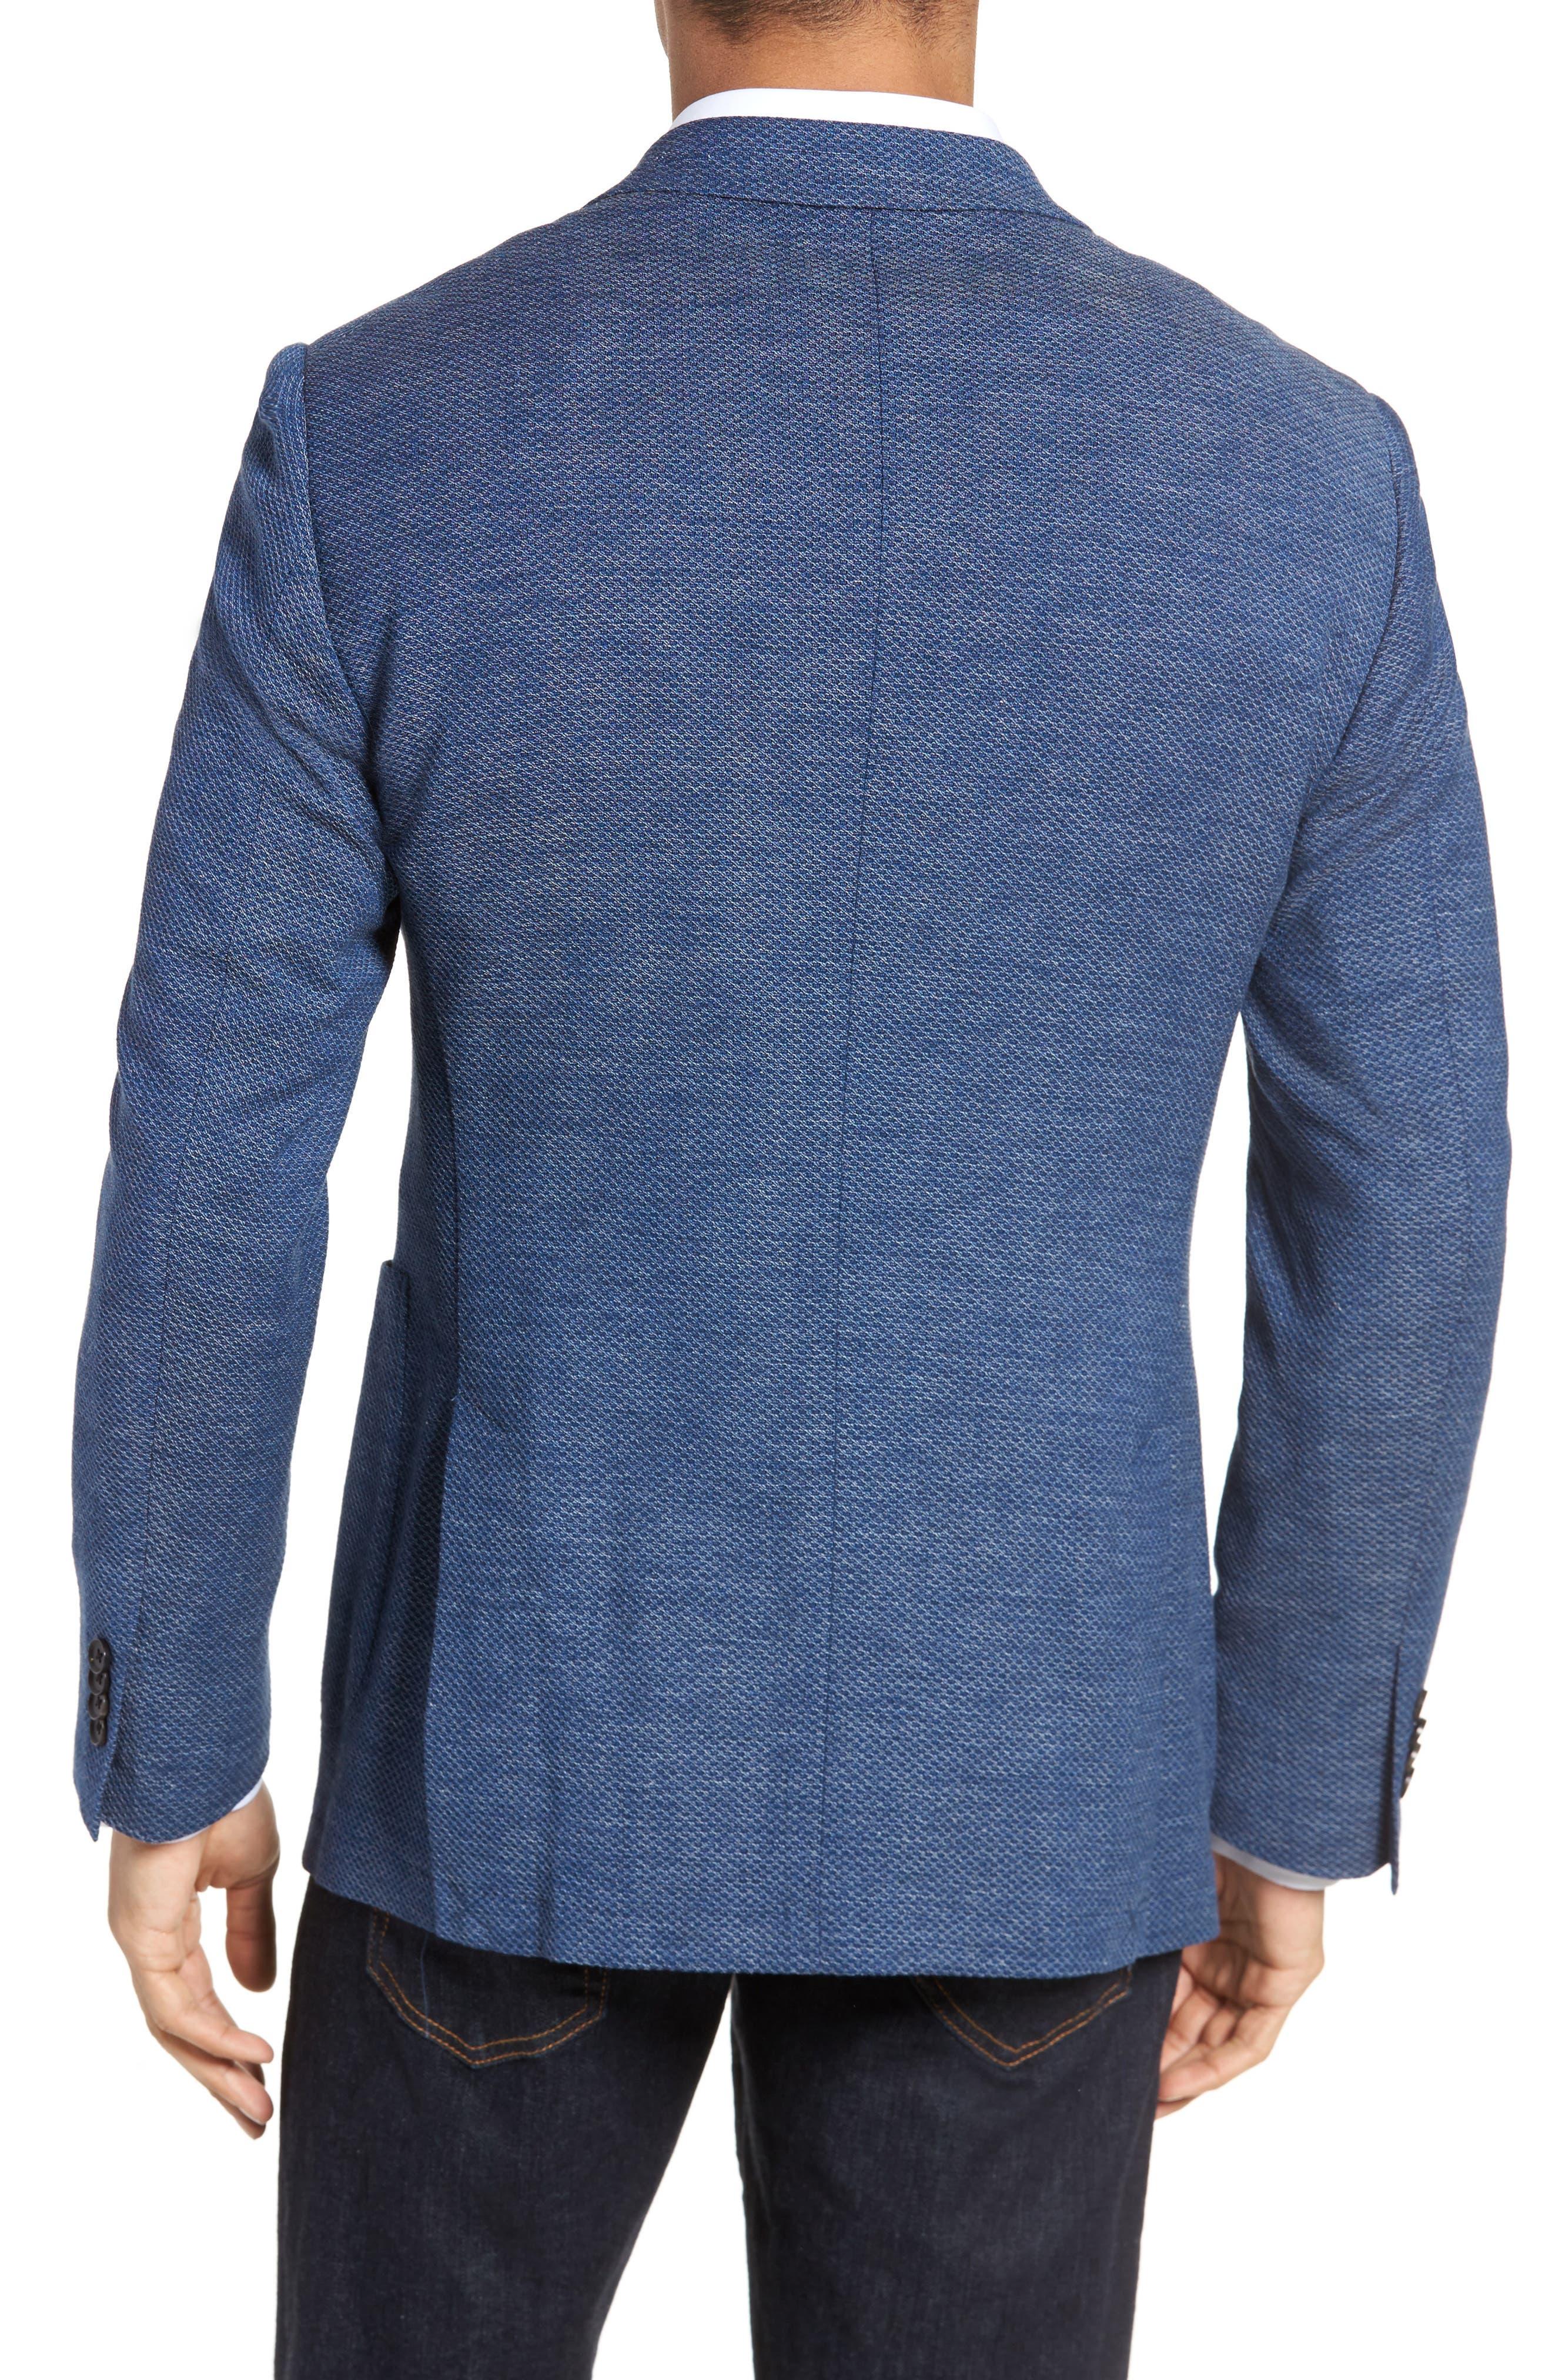 Fife Street Wool Blend Blazer,                             Alternate thumbnail 2, color,                             432